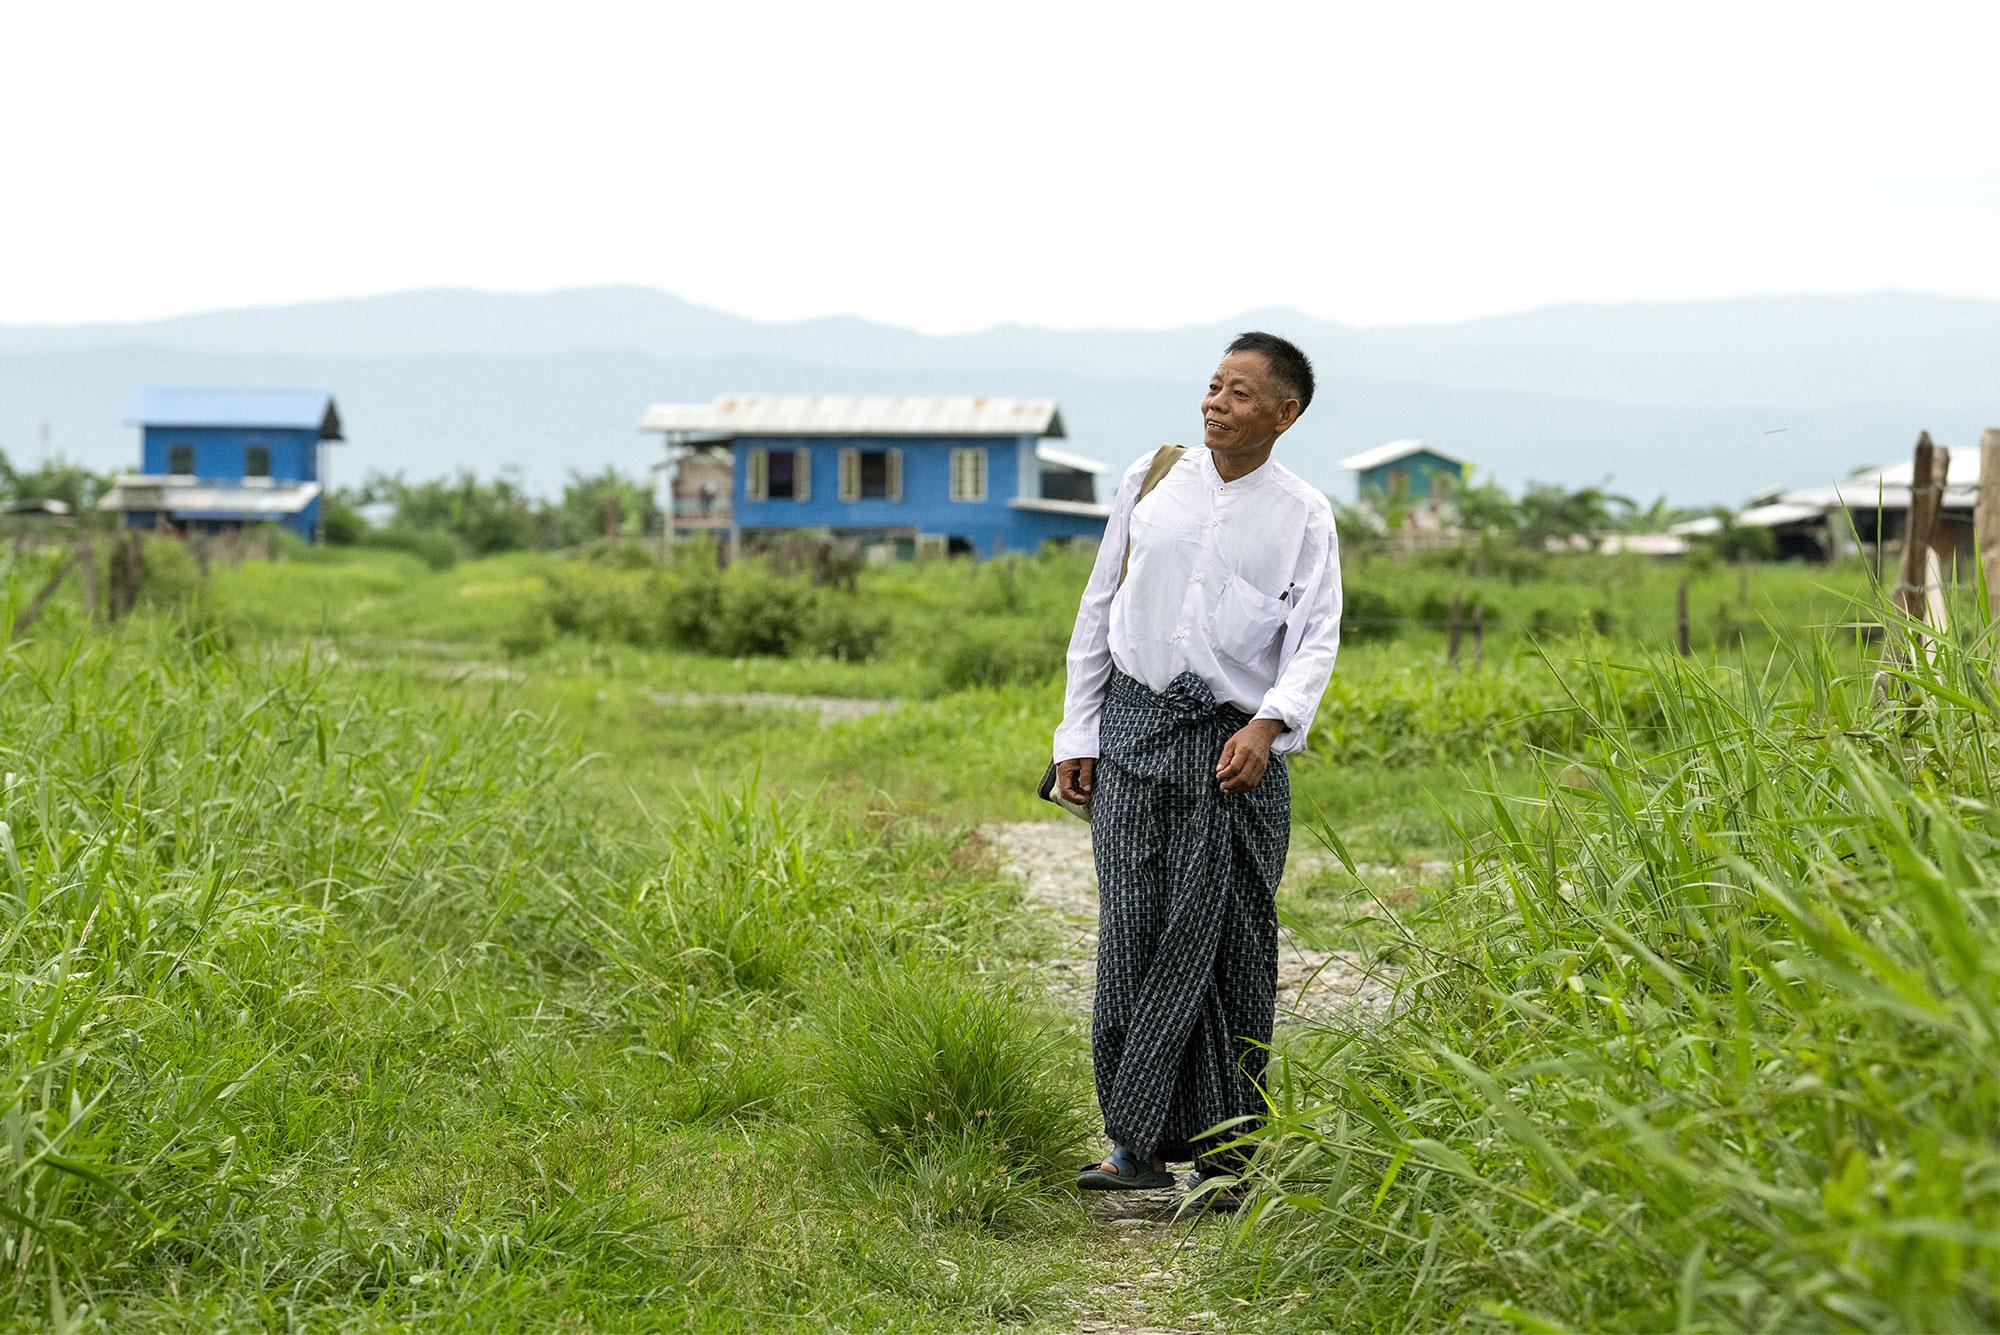 Man walking a grassy trail, looking hopeful